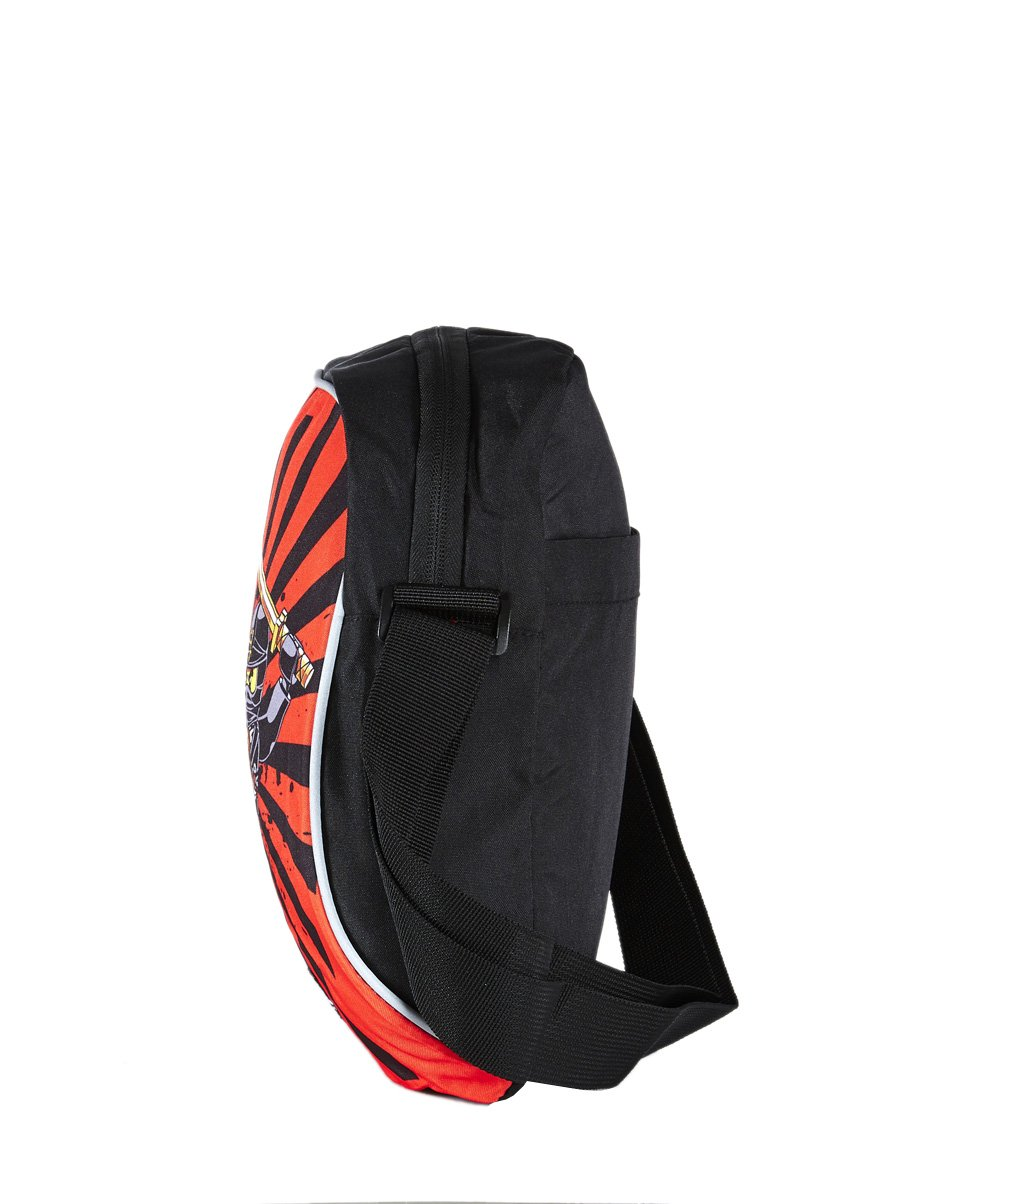 27 cm Red 2 liters Rojo Lego Tablet Bag Vline Ninjago Kai Messenger Bag